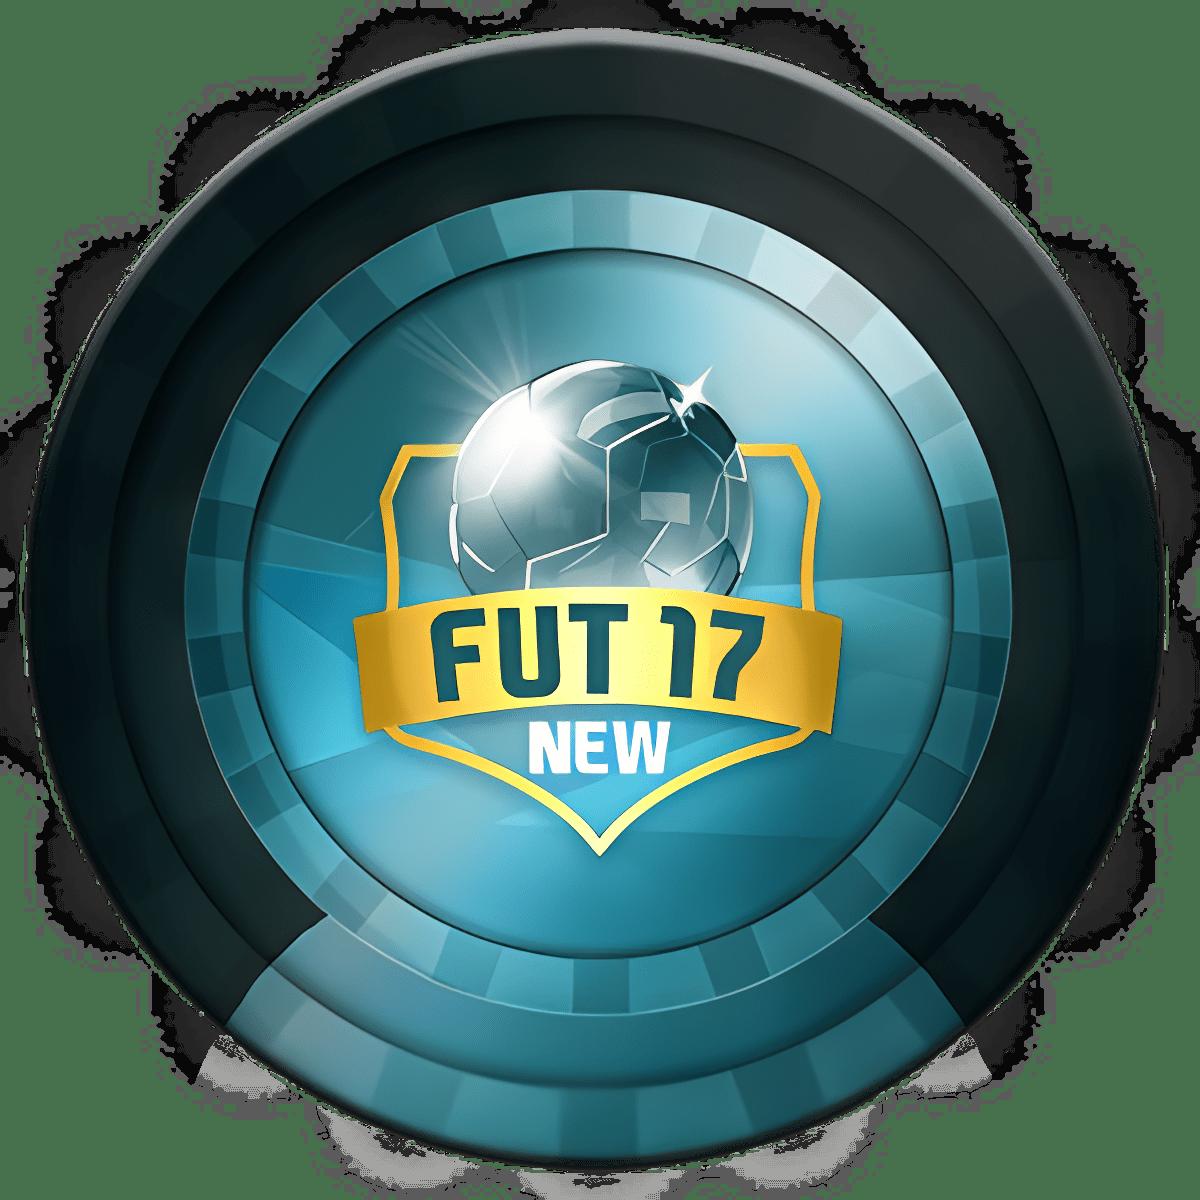 New FuT 17 Draft simulator